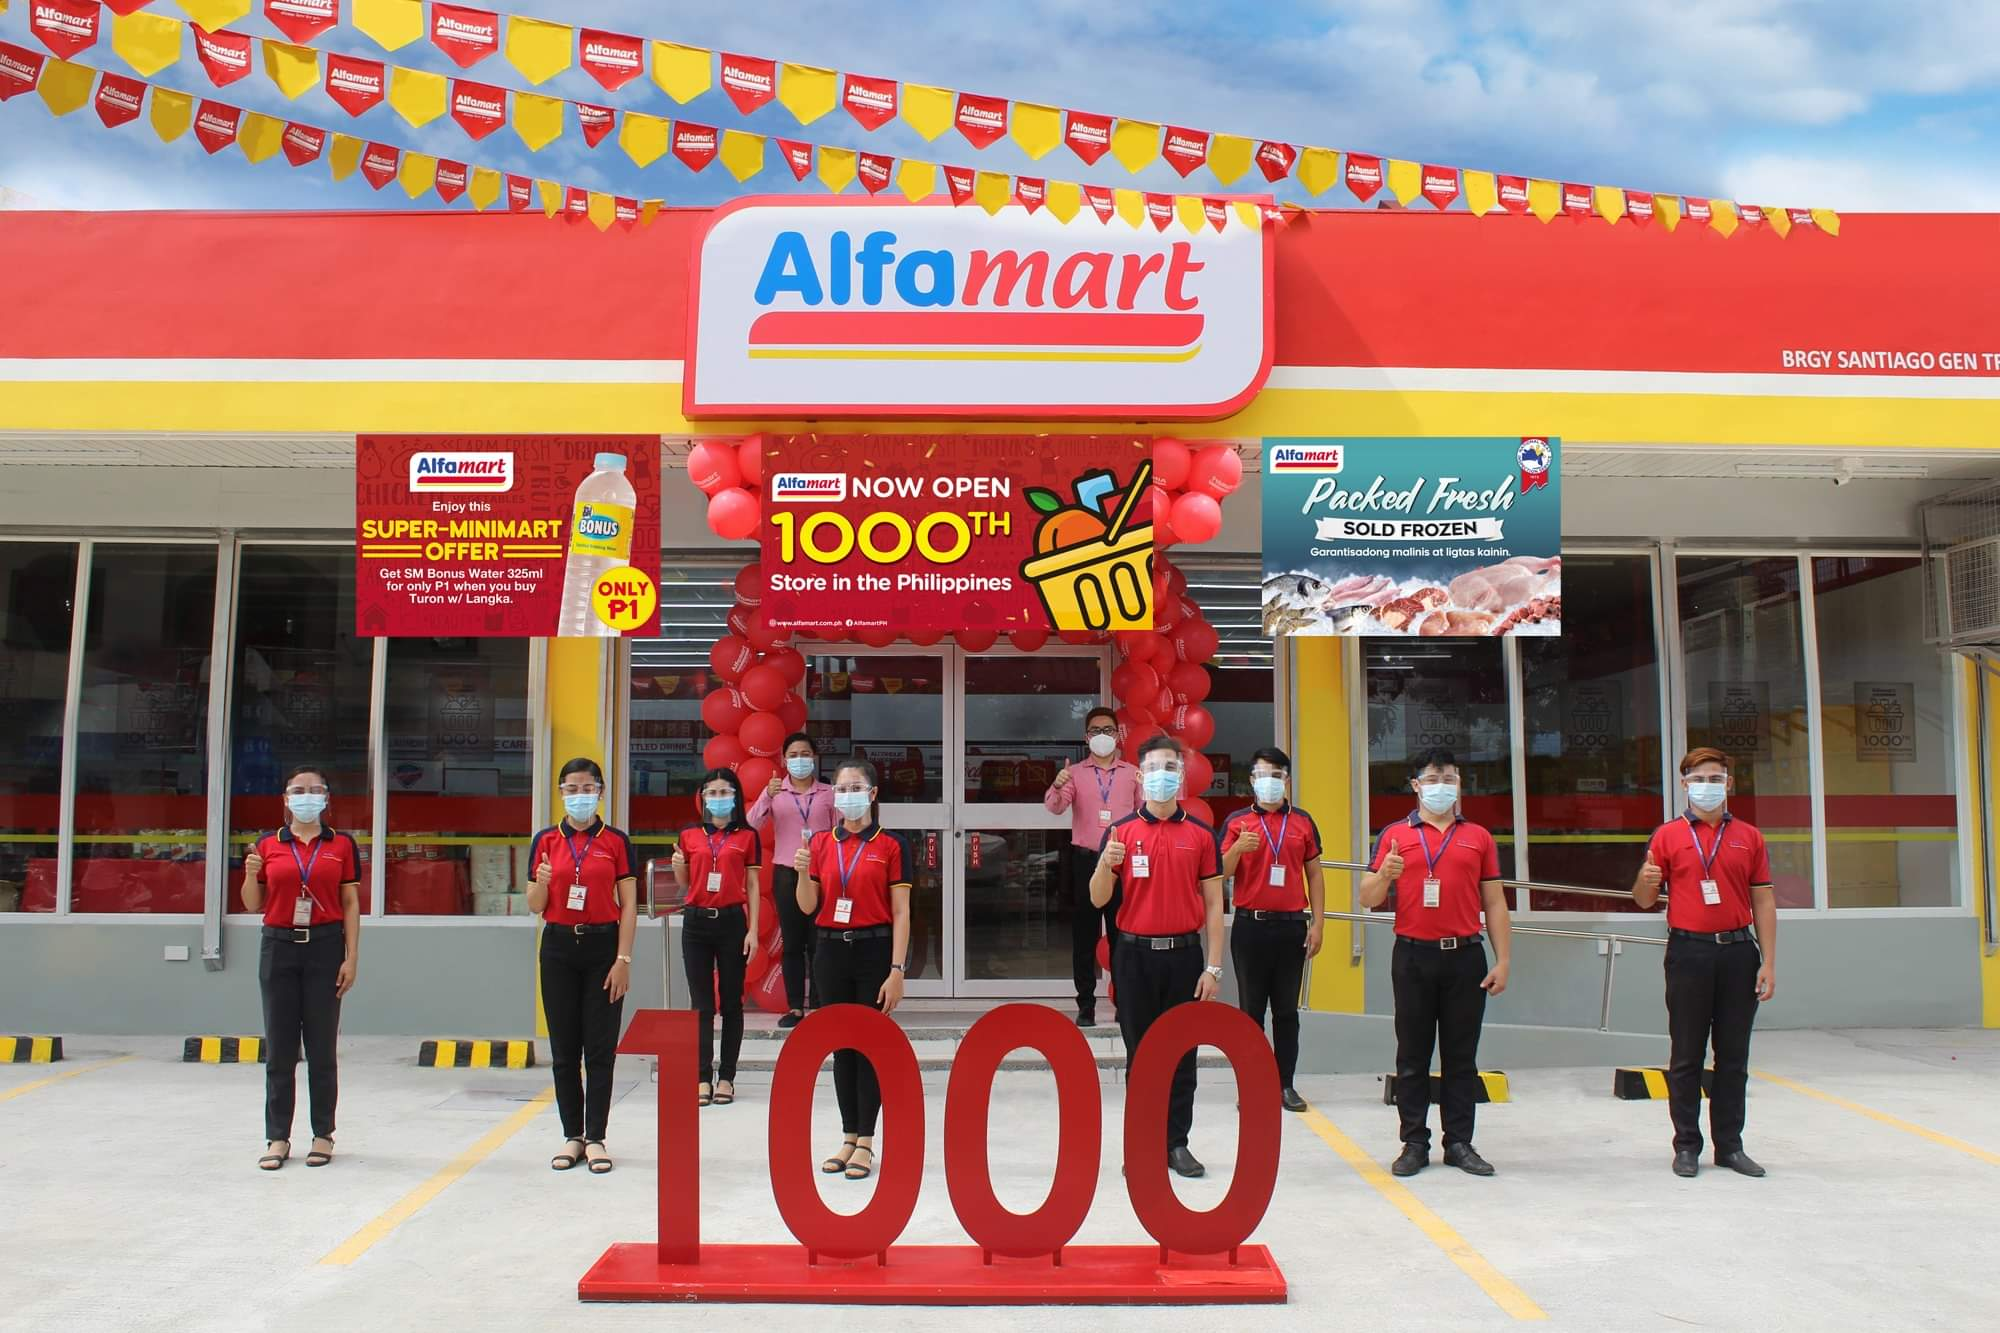 Alfamart's 1000th Store!